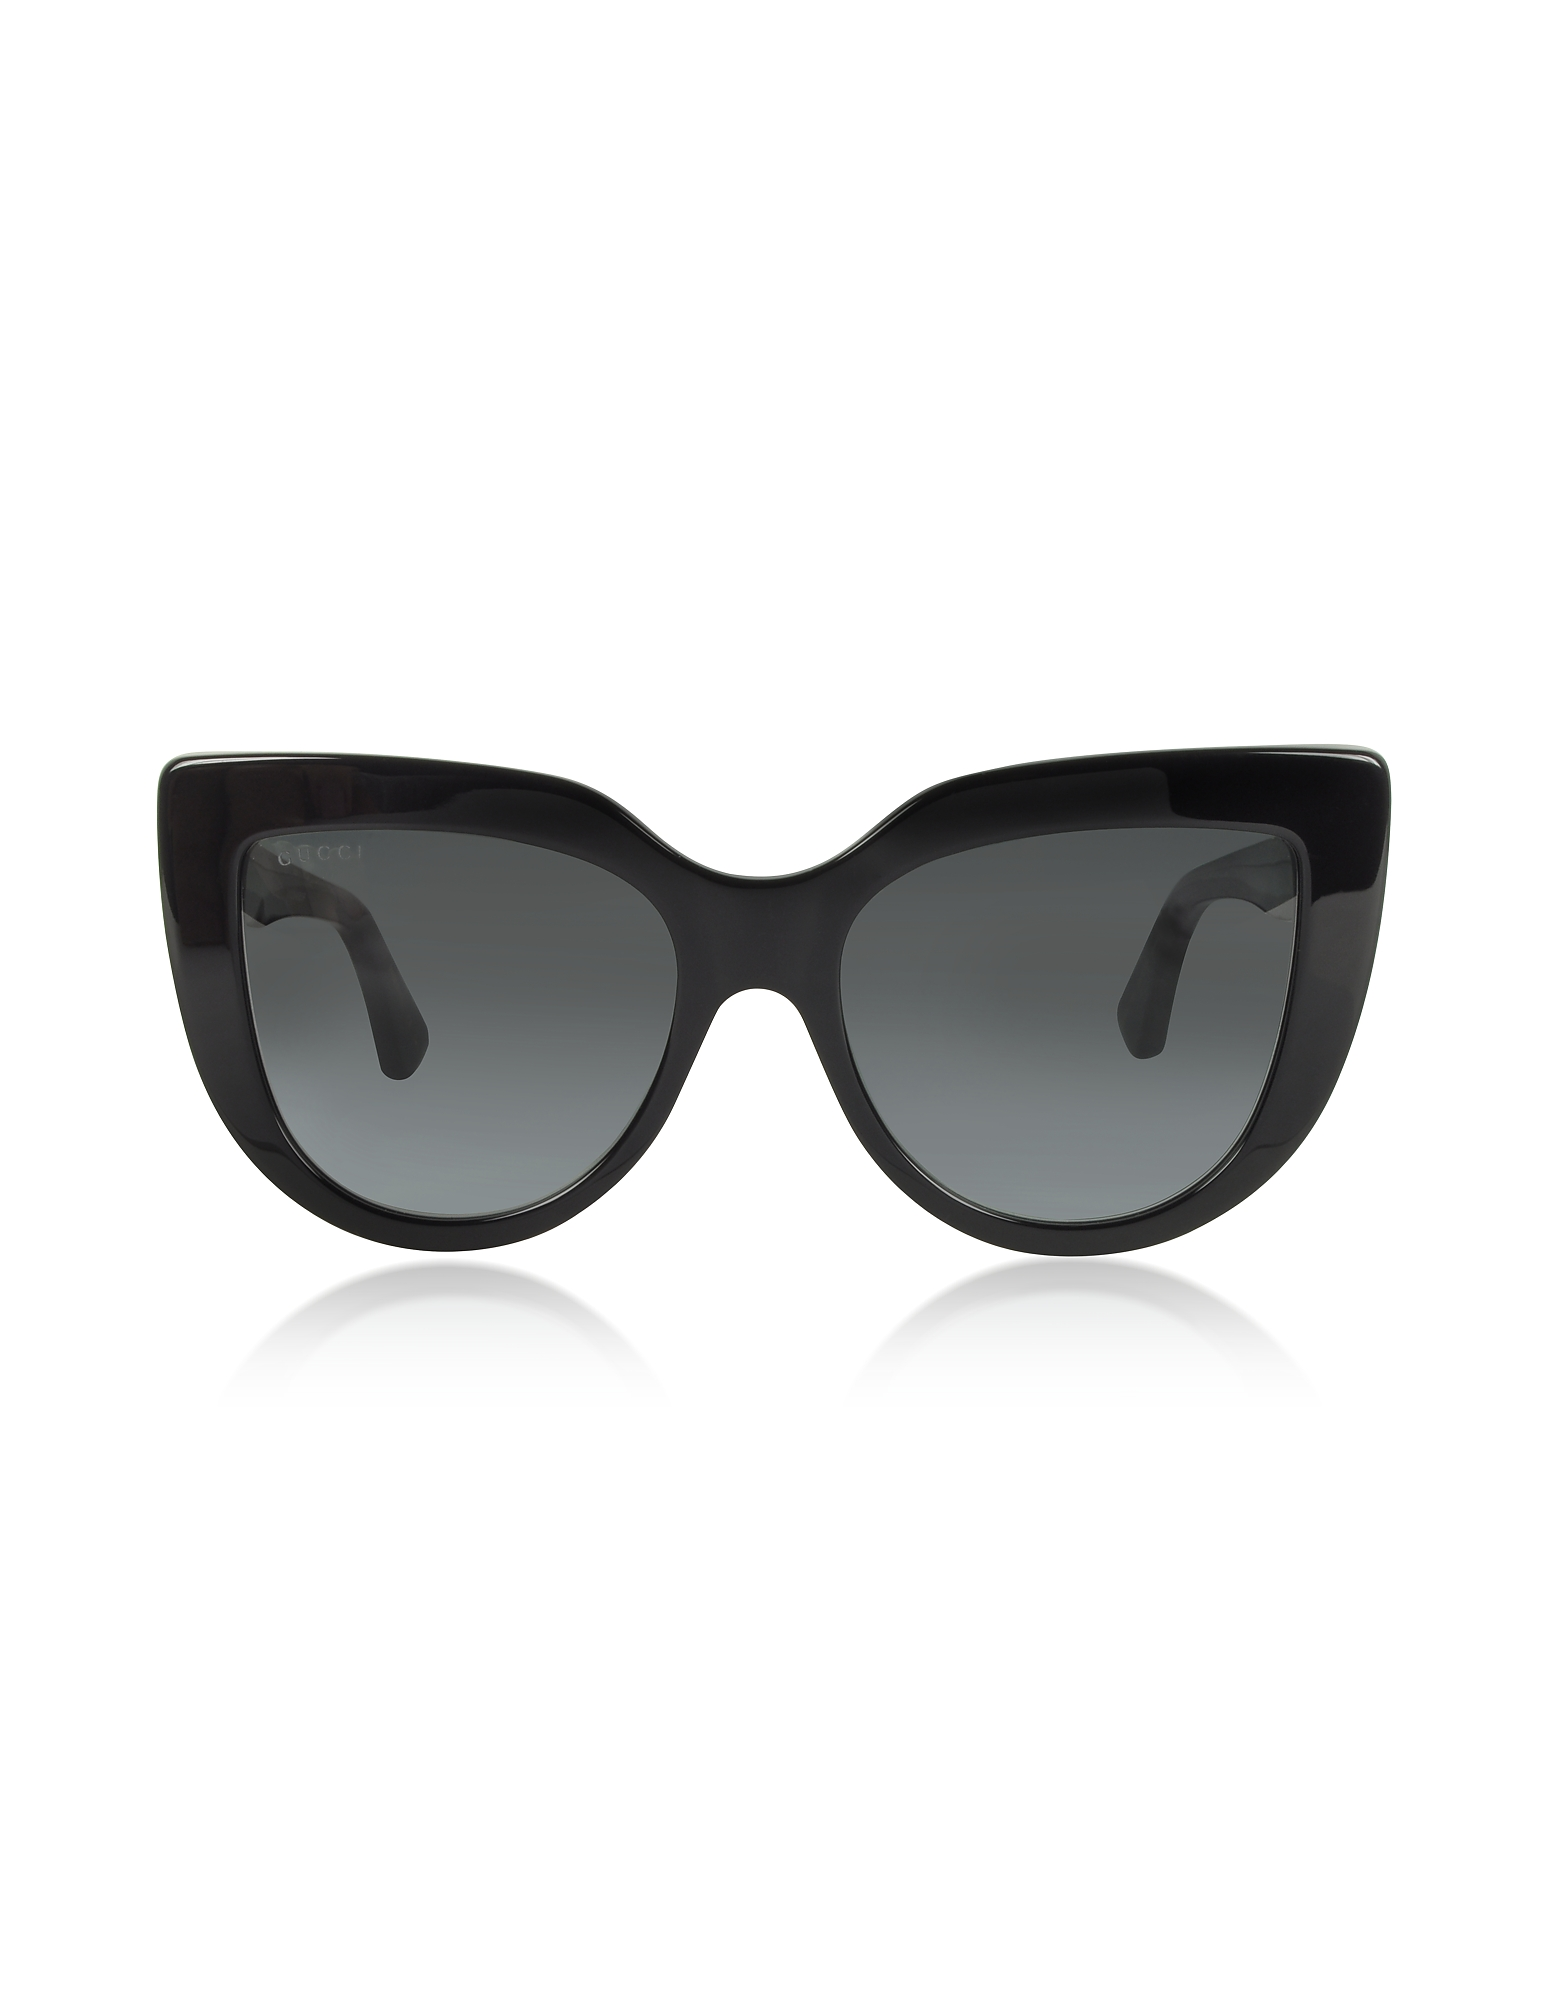 Gucci Sunglasses, GG0164S 001 Black Optyl Cat-Eye Women's Sunglasses